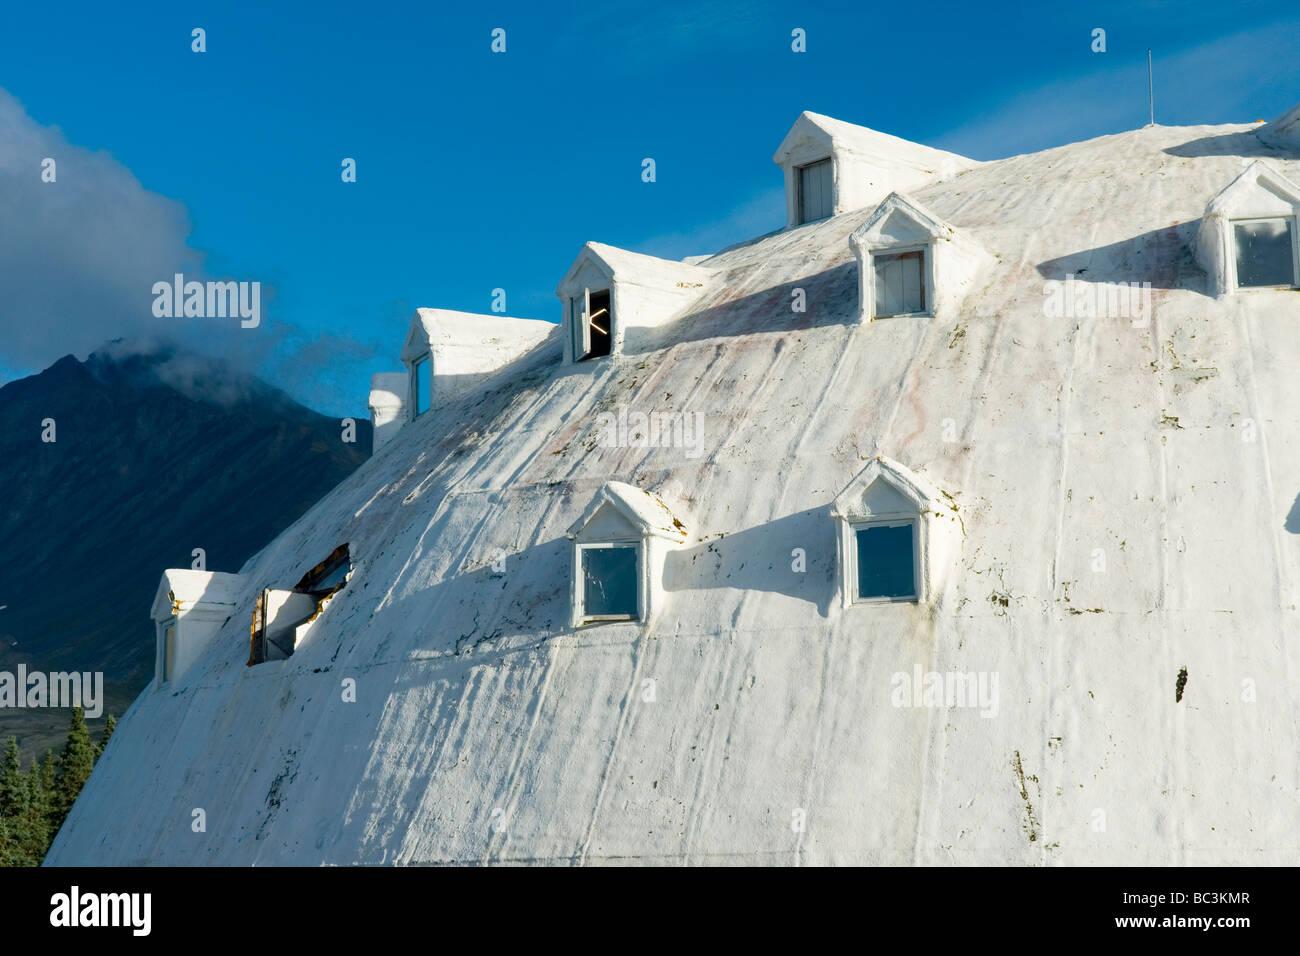 Igloo Village Gas Station Alaska - Stock Image